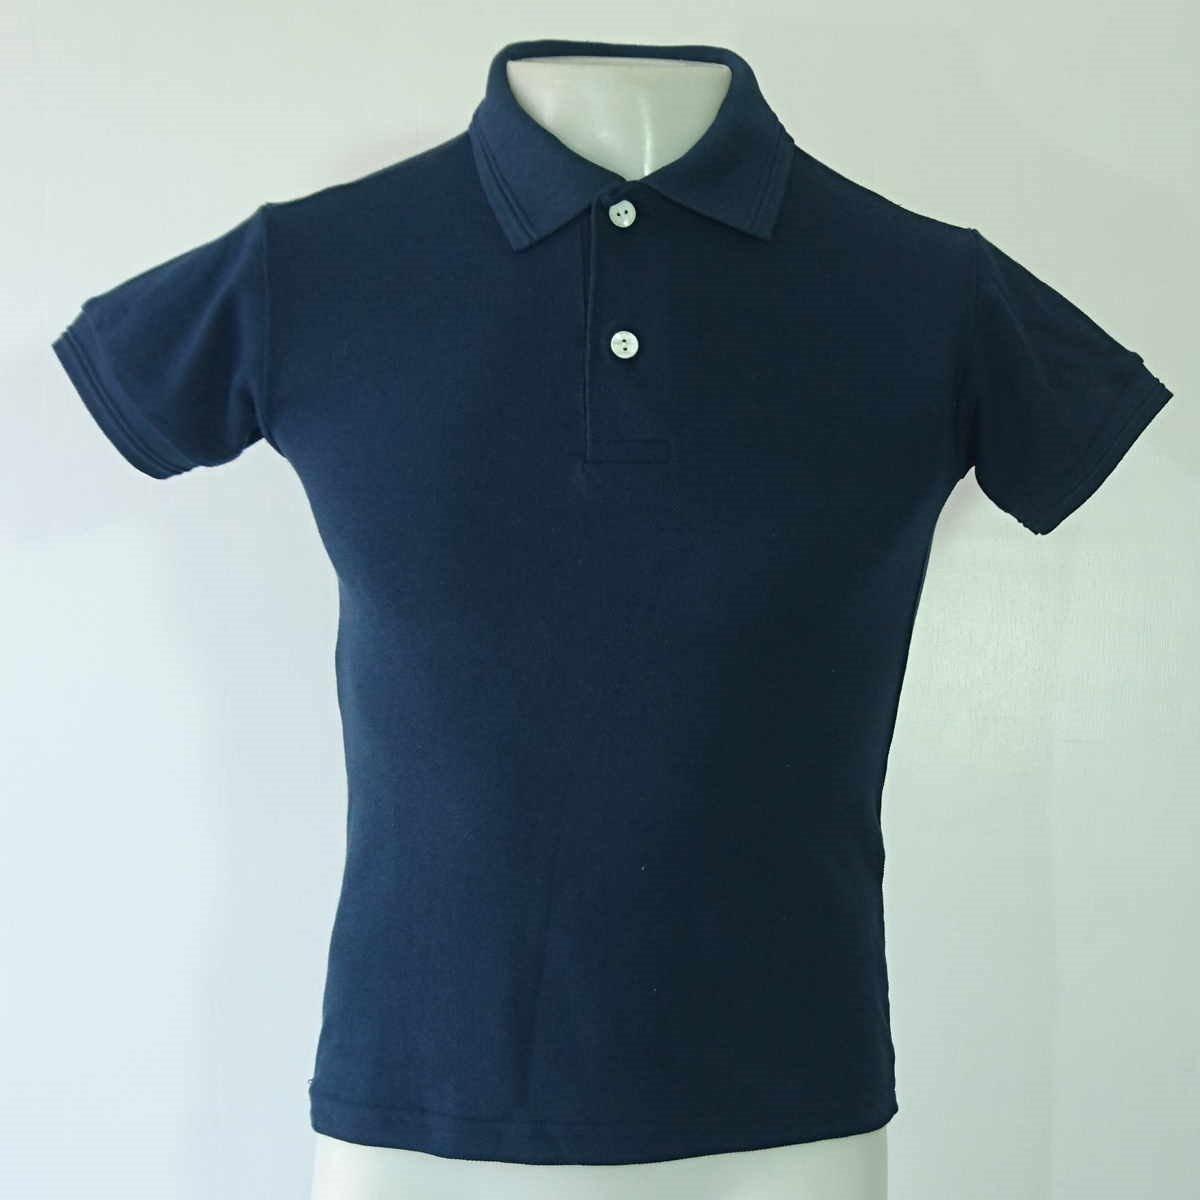 bbba1dcc6d Camisa Polo Masculina Gola Polo Camiseta Alto Padrao - R  29